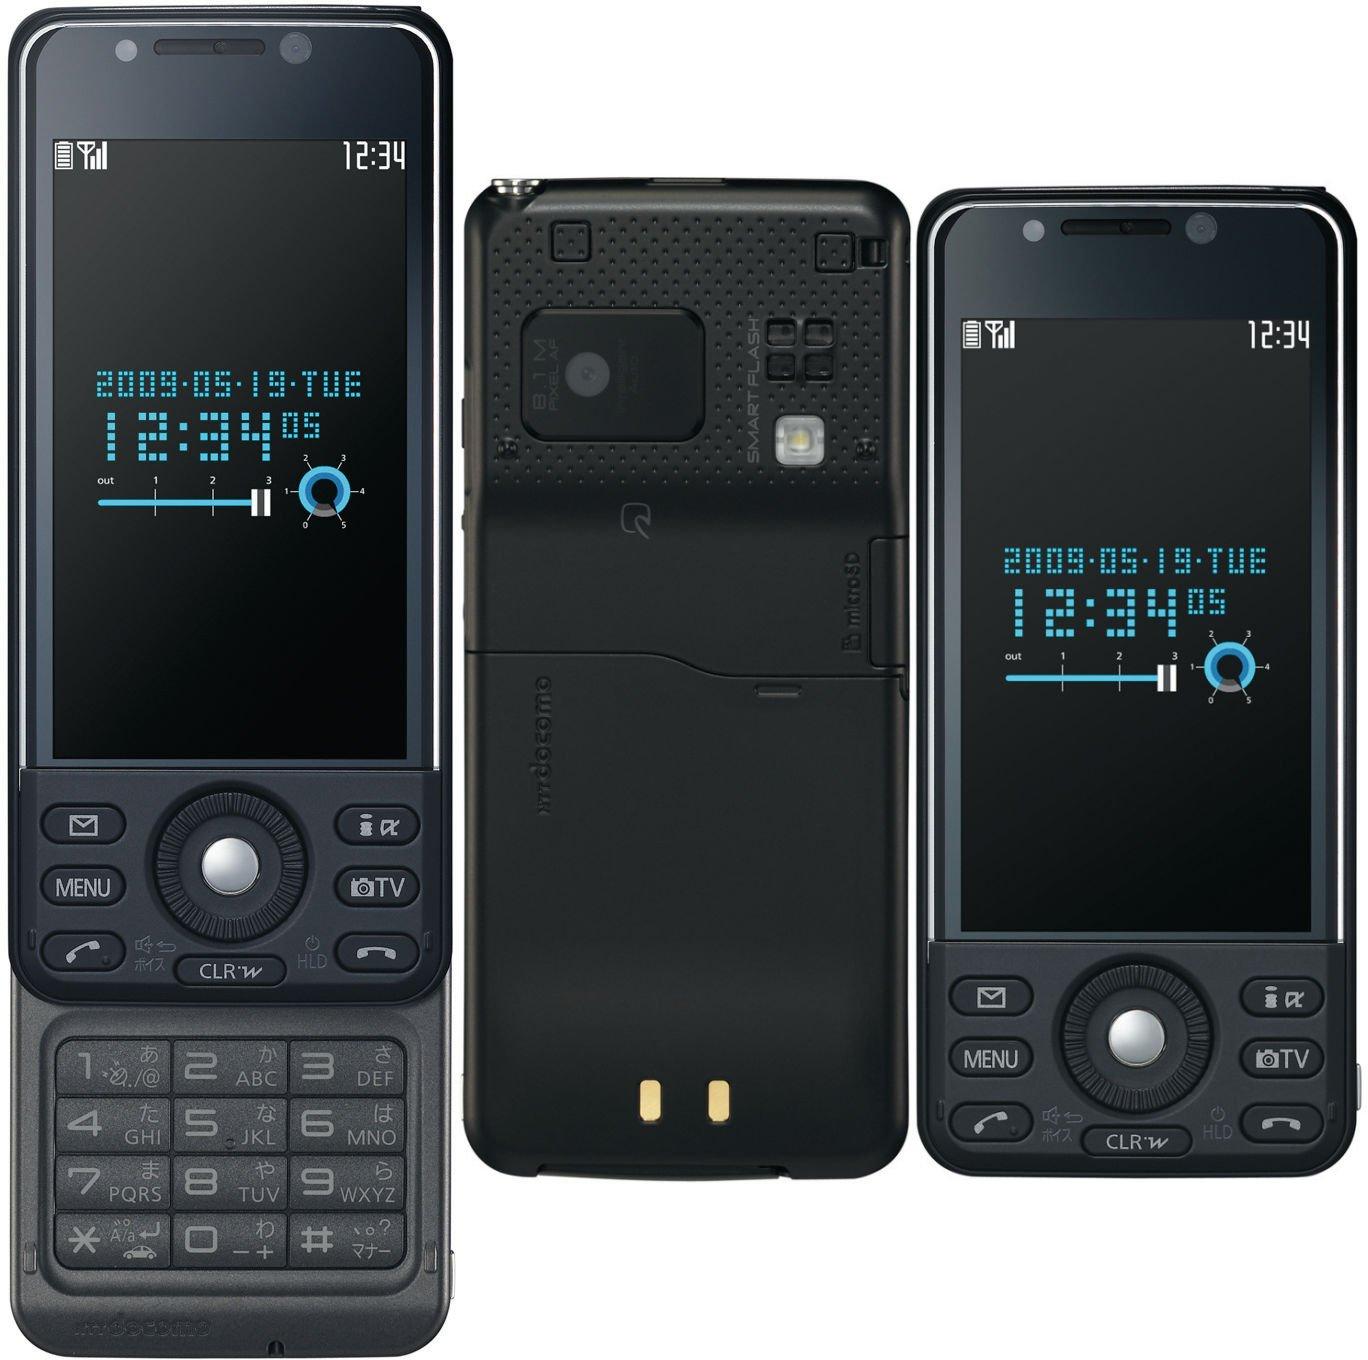 P-08A マットブラック 携帯電話 白ロム ドコモ docomo   B004V23DMK